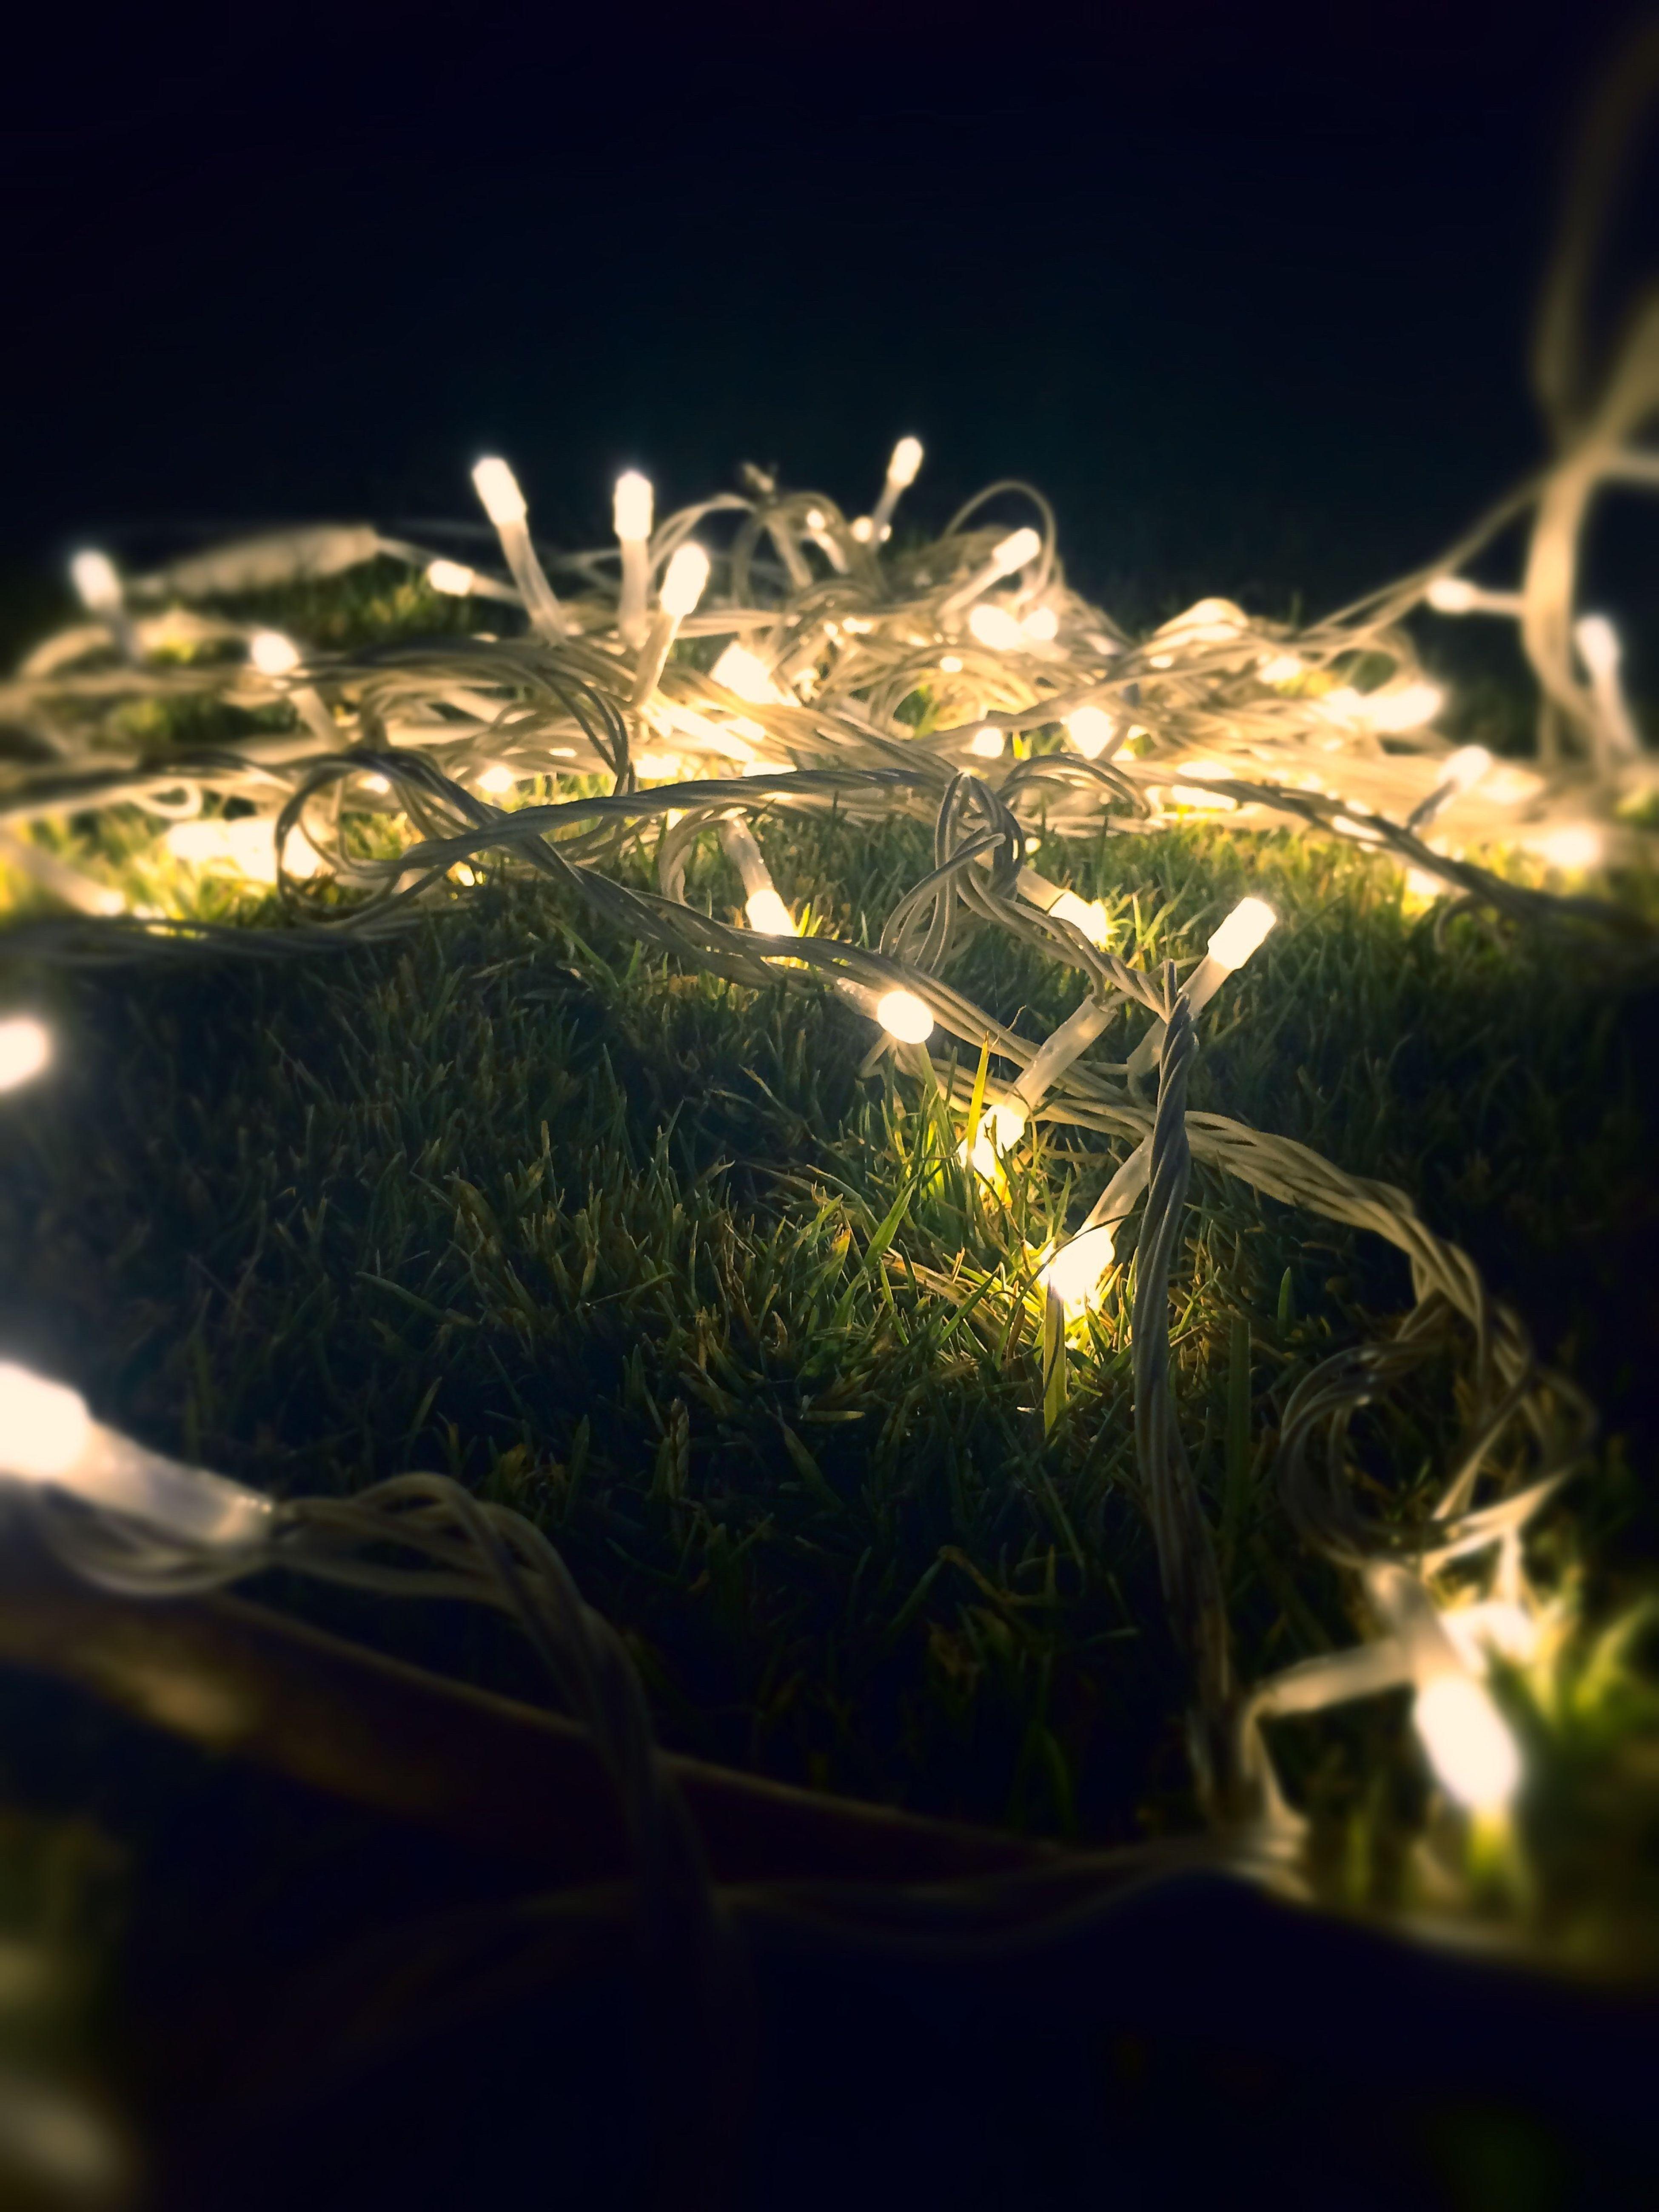 LED's On Grass 💙🔥 Night Illuminated Grass Photography Close-up Led Lights